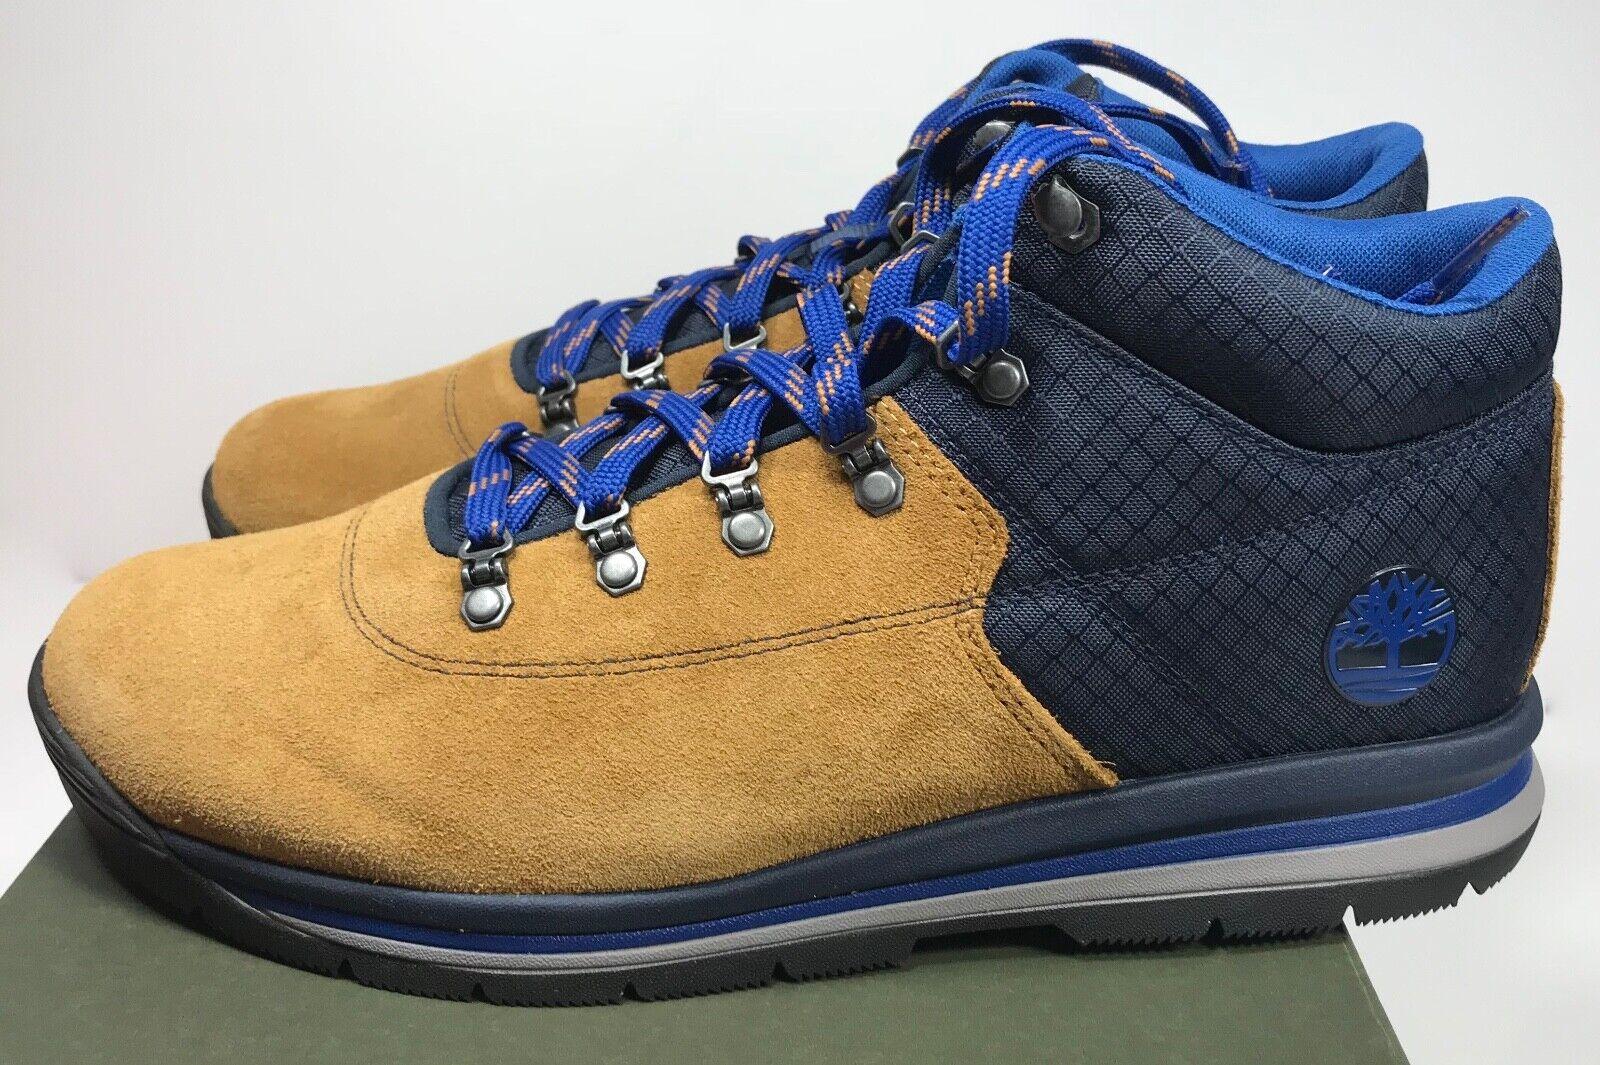 Timberland Men's GT Rally Shoes Mens 10.5 TB0A1QJK M/M